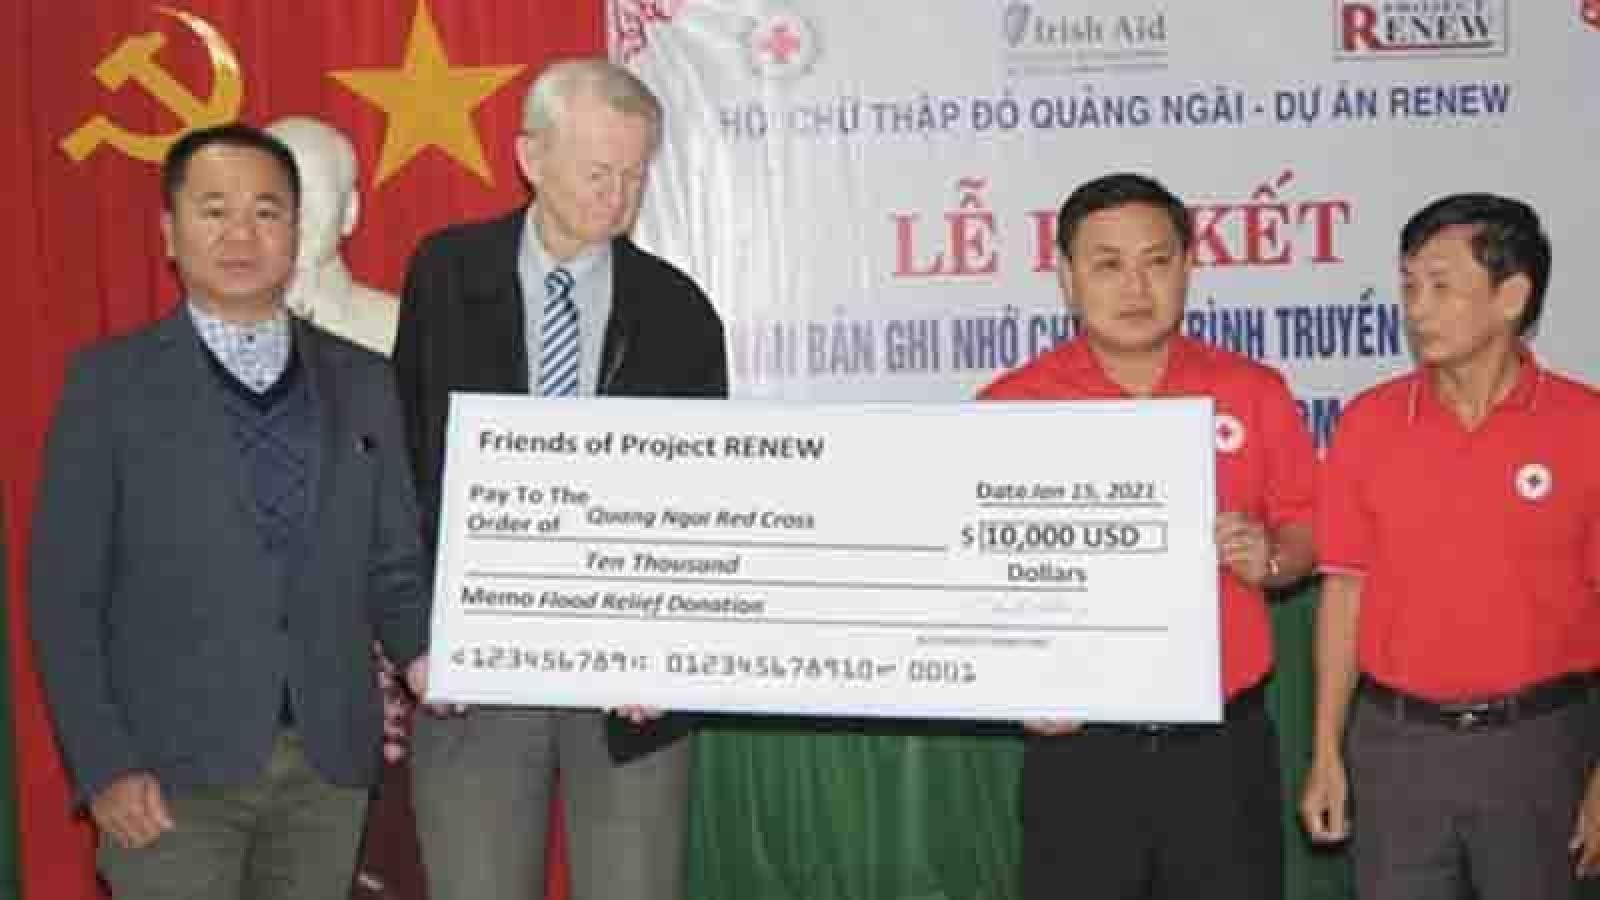 American veterans deliver flood relief to Vietnam